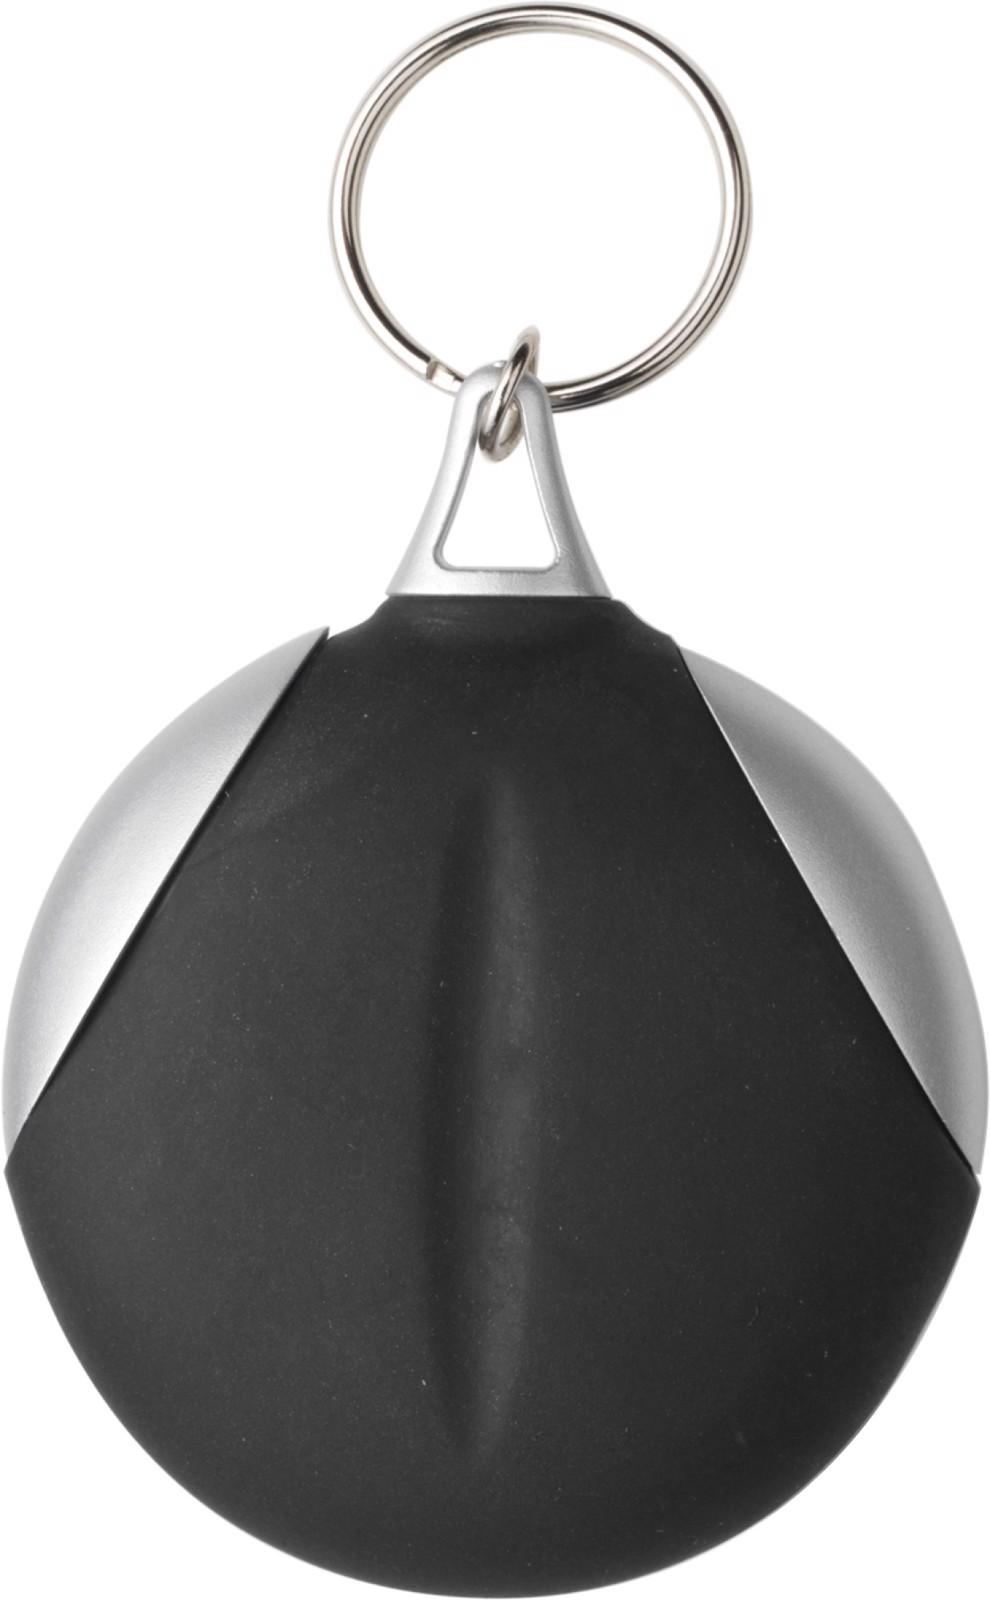 Vinyl key holder with fibre cloth - Black